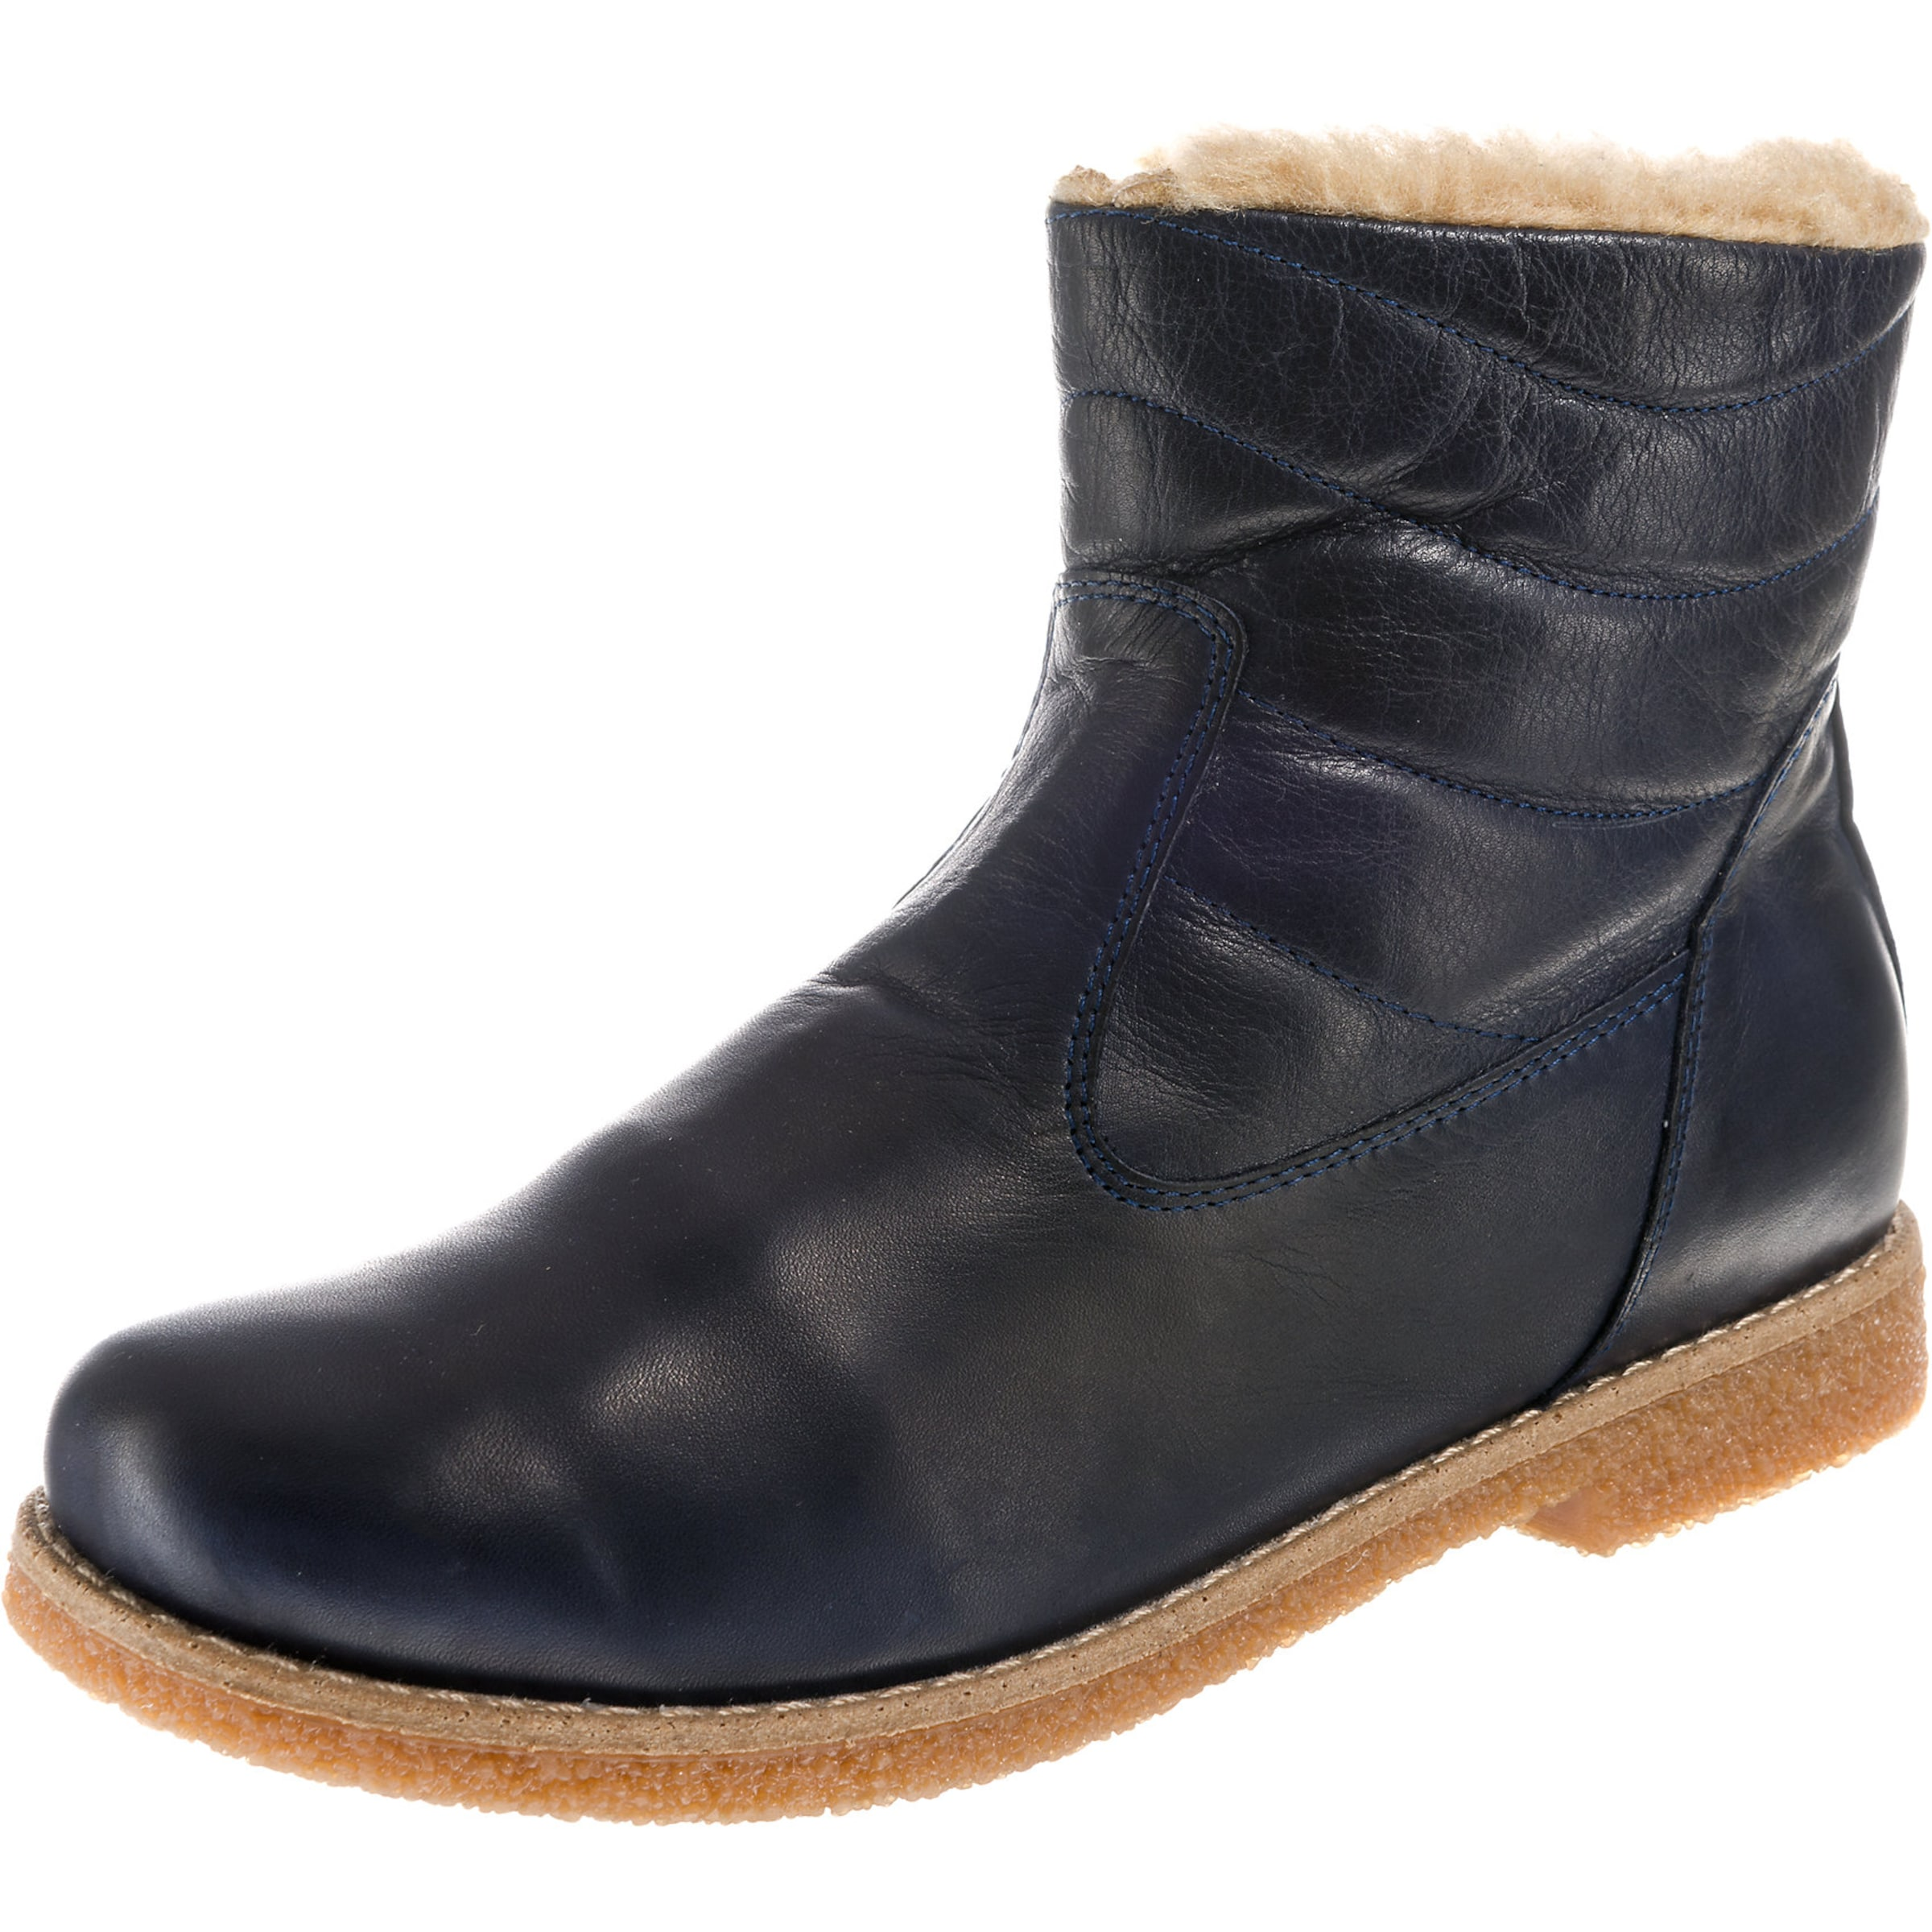 ANDREA CONTI Winterstiefeletten Günstige und langlebige Schuhe